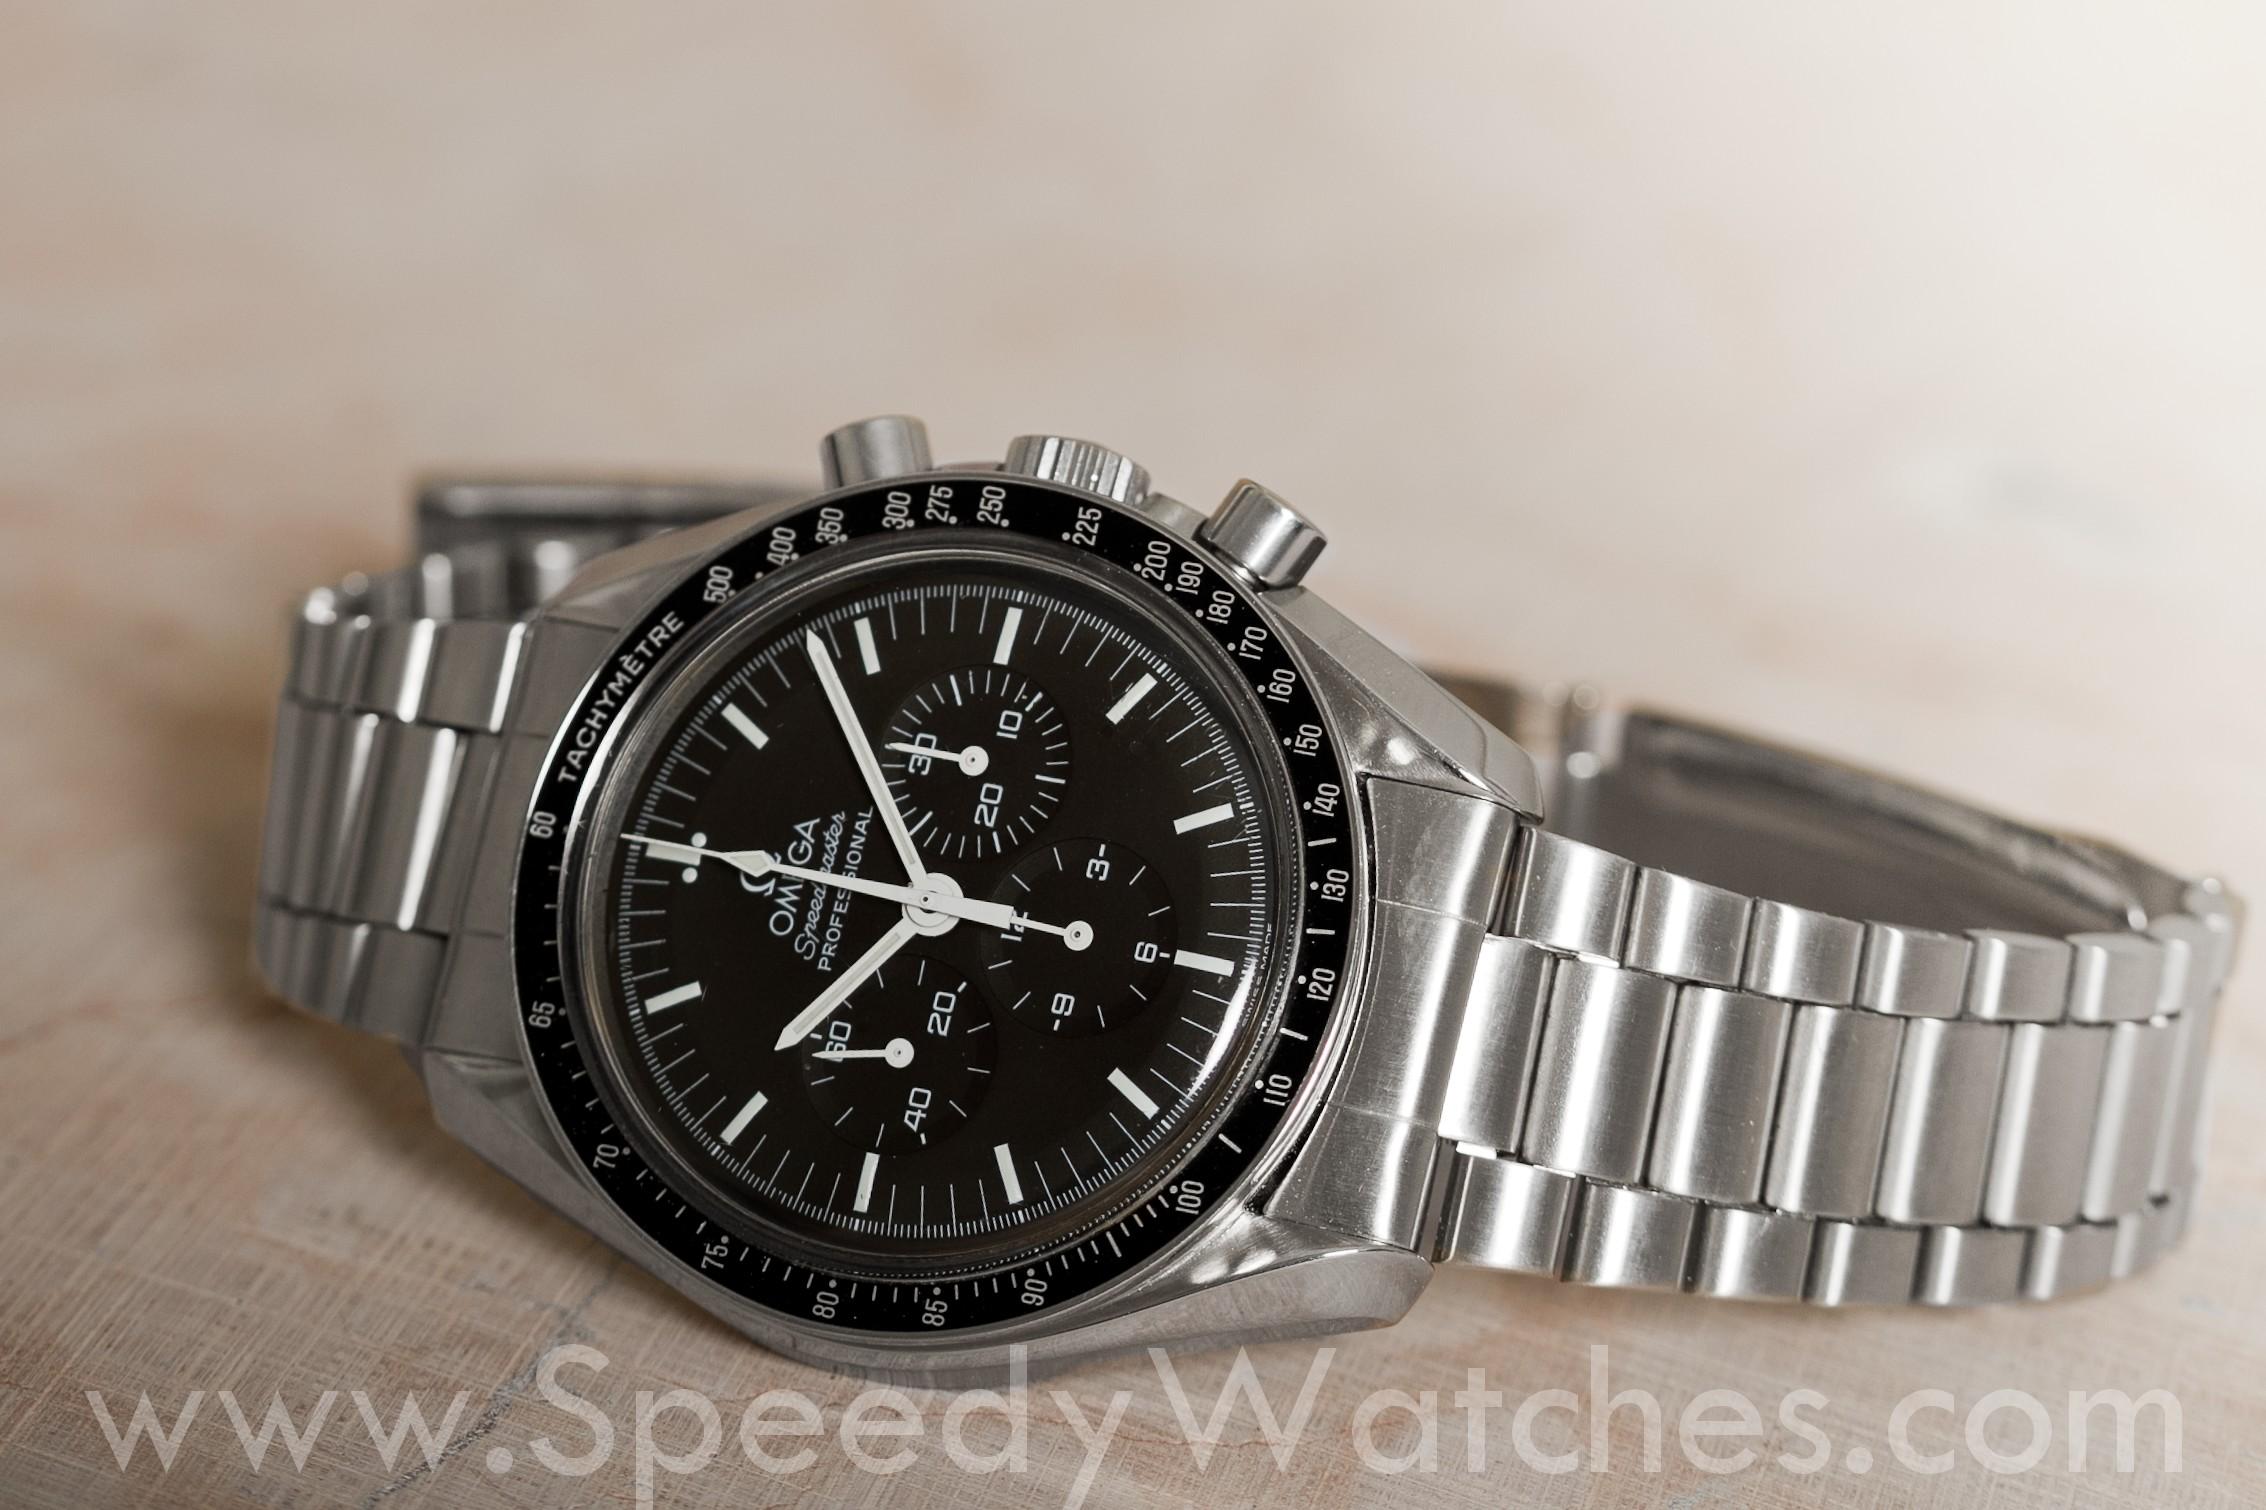 Speedy Watches Everything Omega Speedmaster